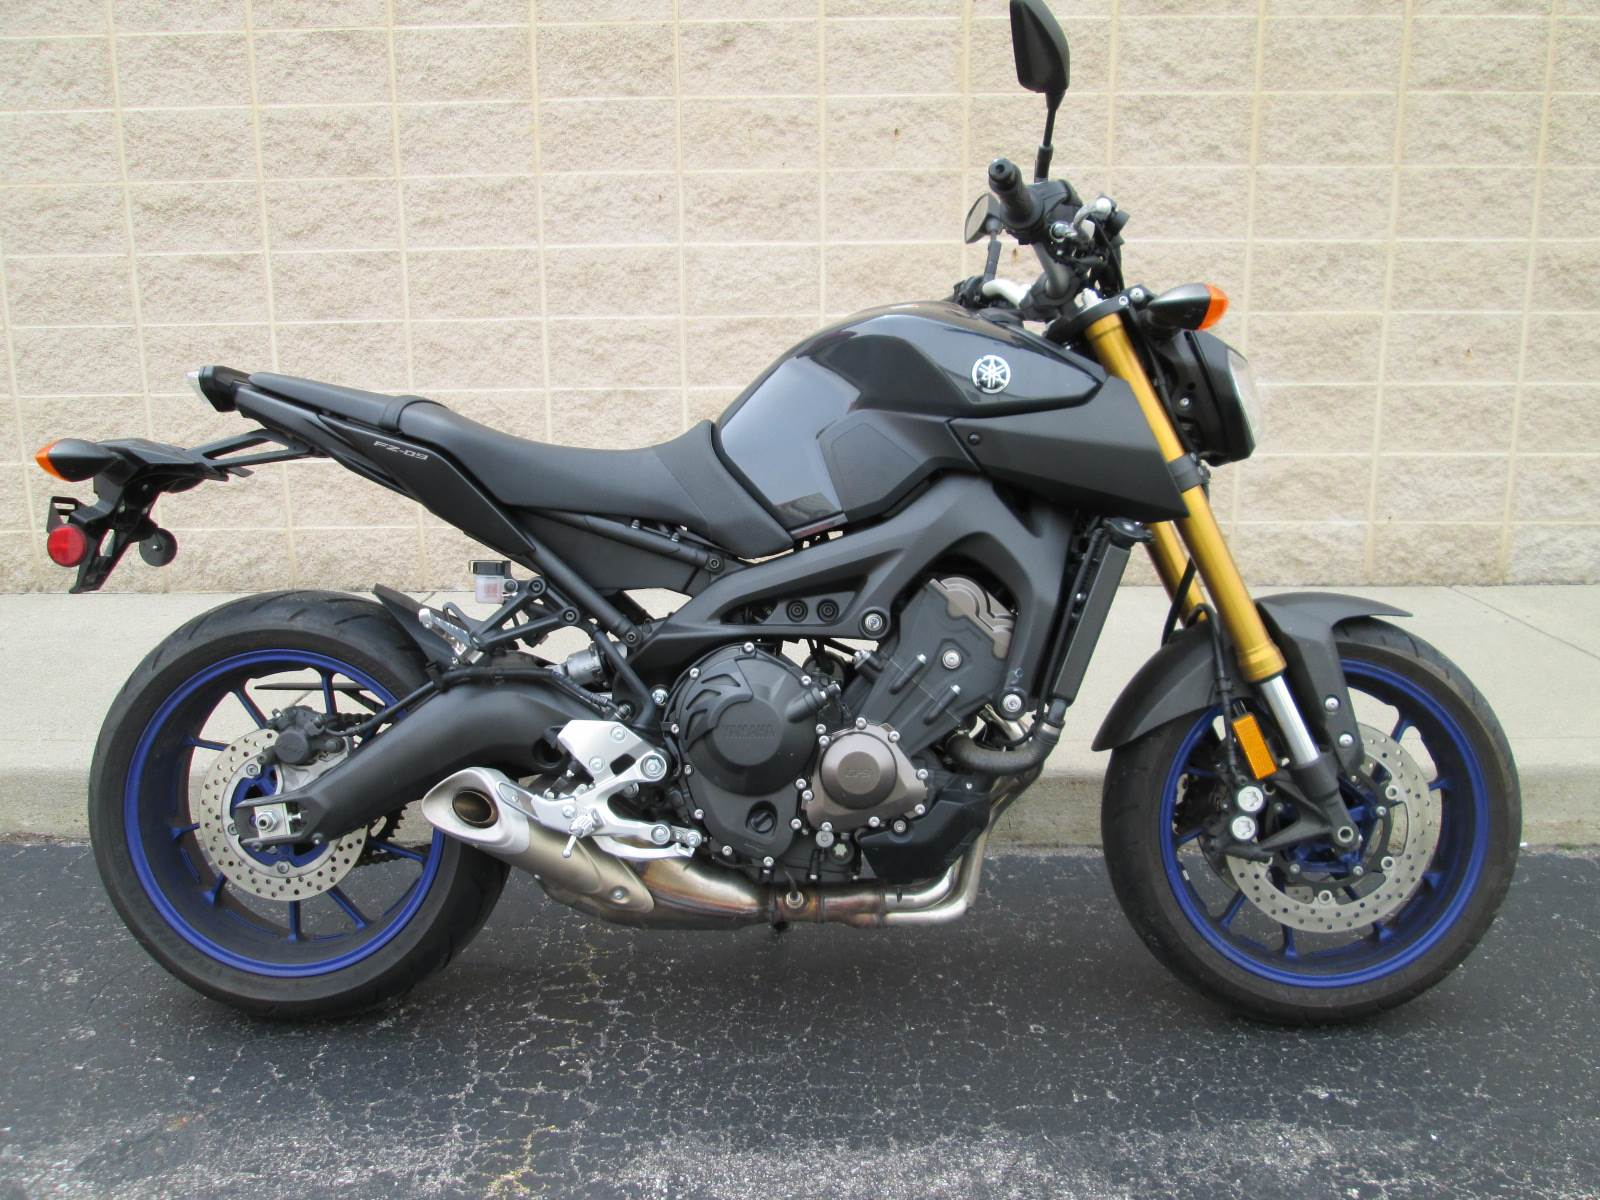 2014 Yamaha FZ-09 for sale 24326